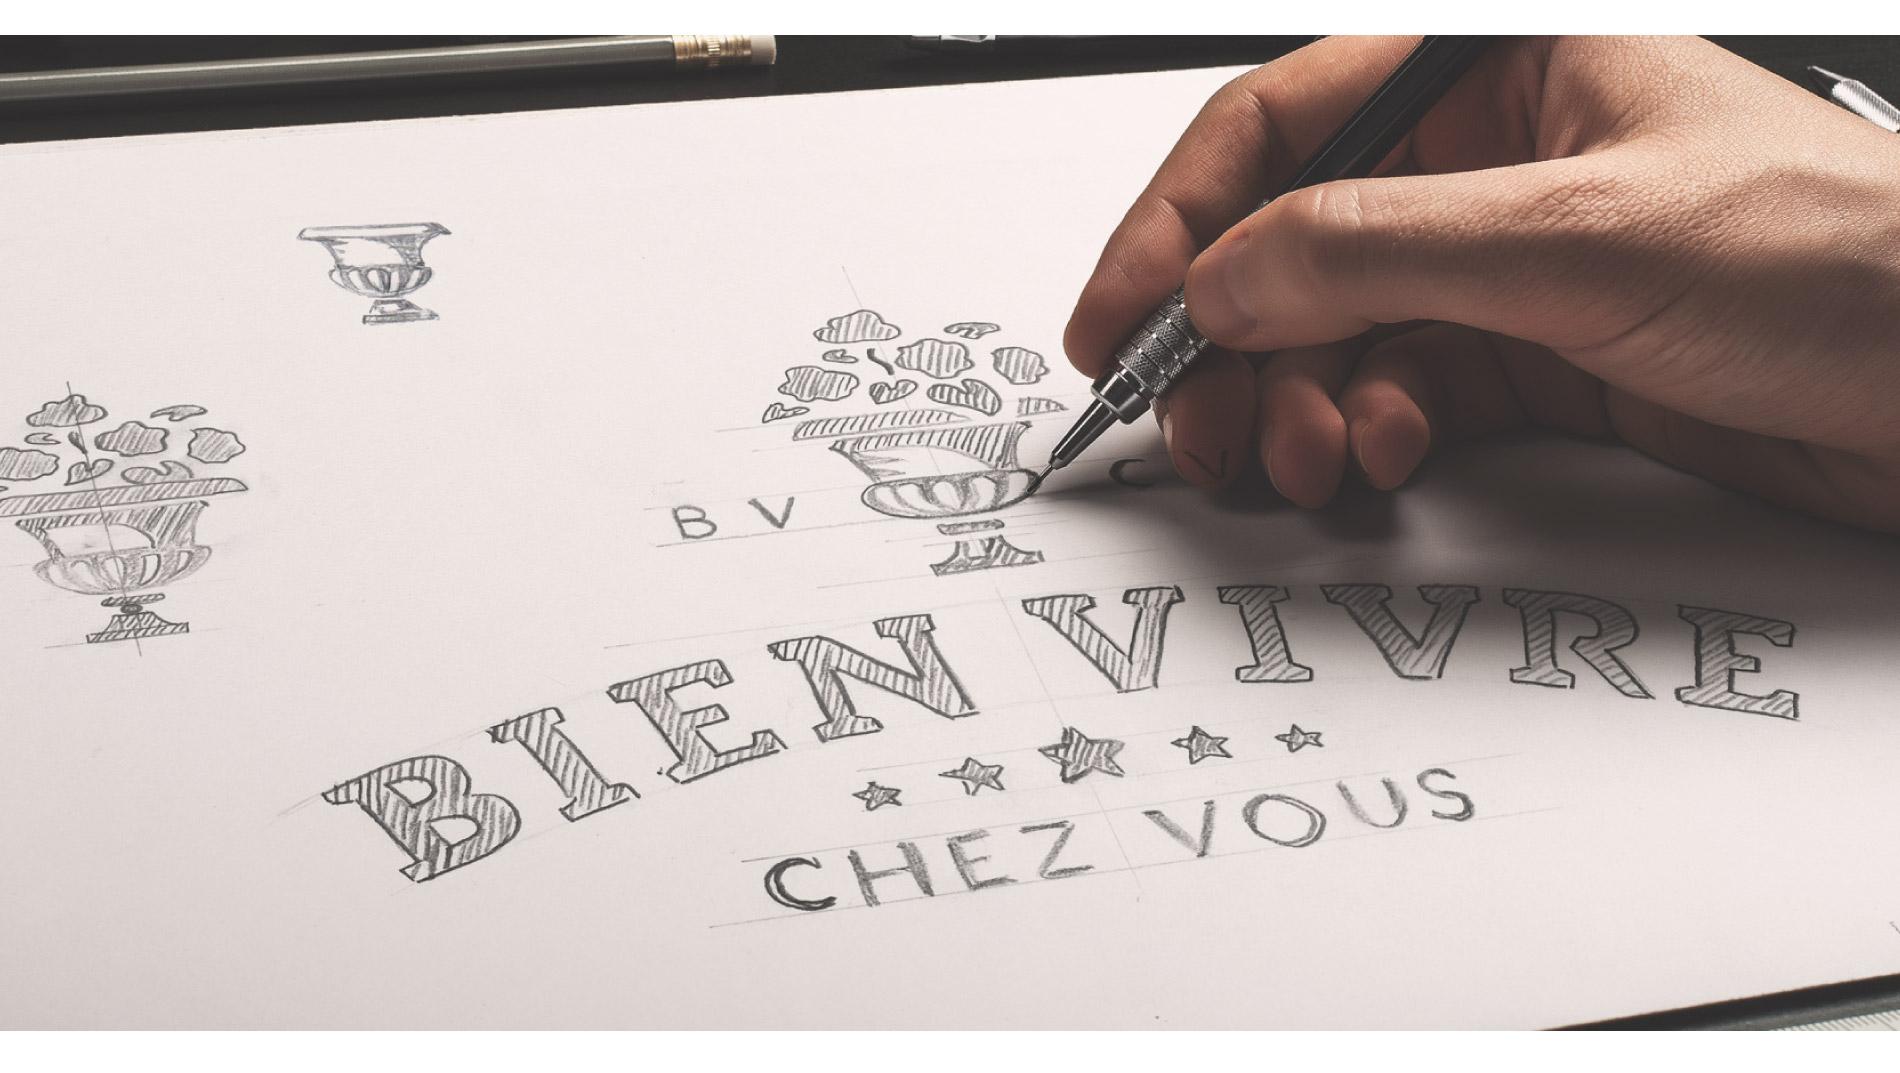 bvcv logo sketch